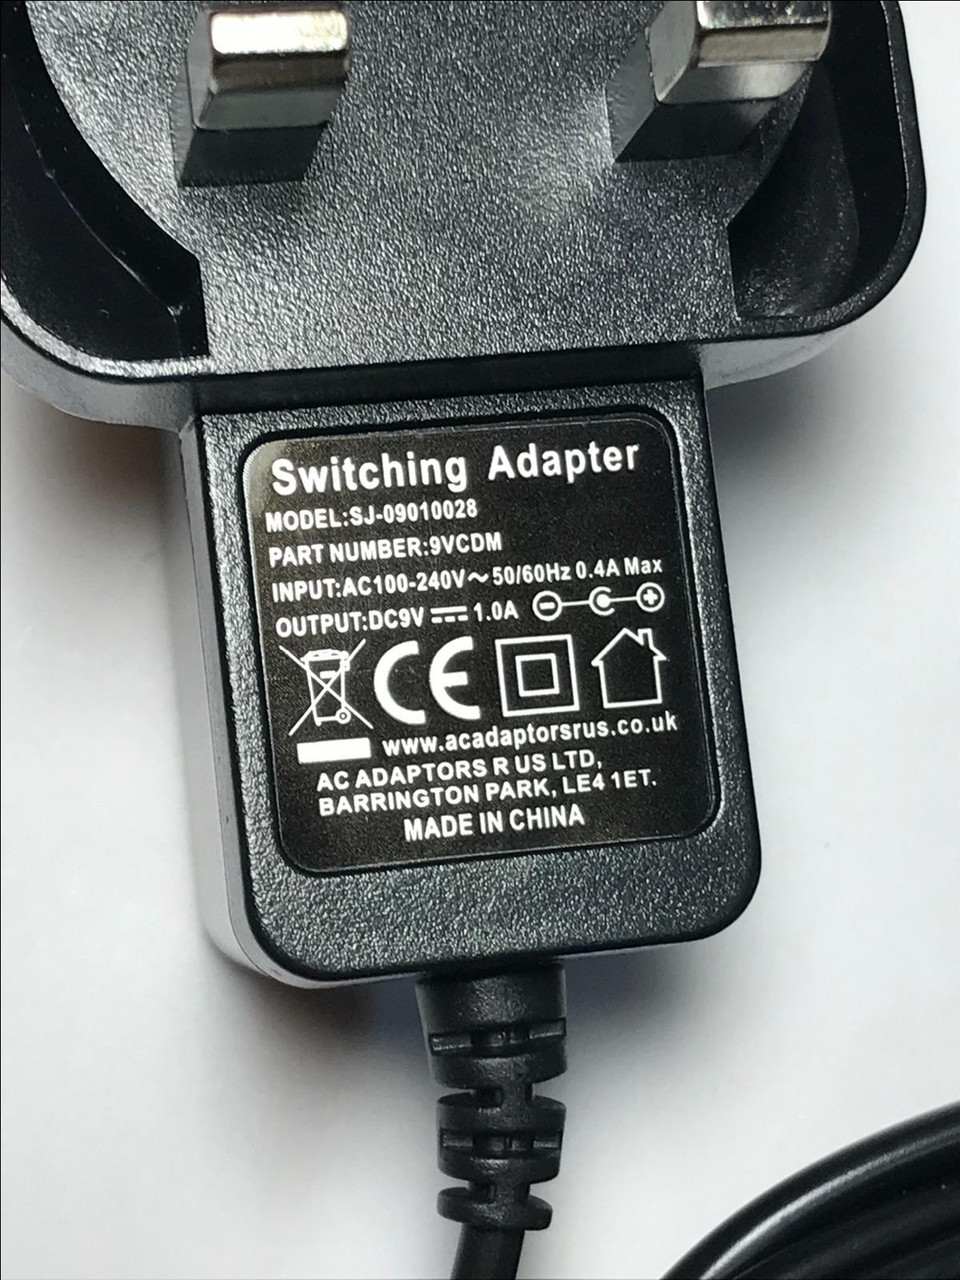 9V AC Power Adaptor EN-957 for Reebok Series 5 Cross Trainer Model No RE-11211